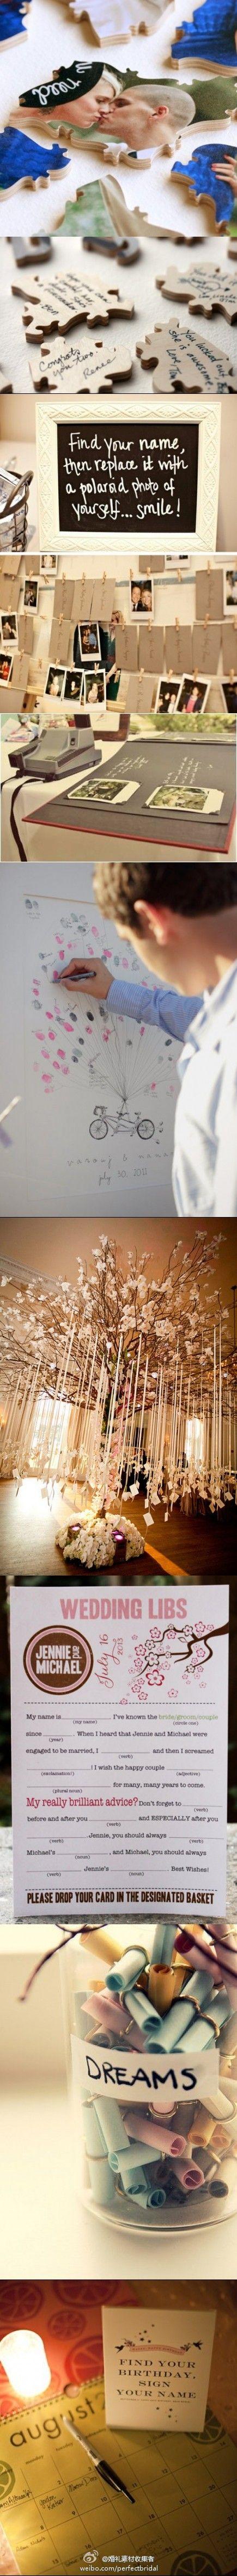 wedding sign-in ideas!